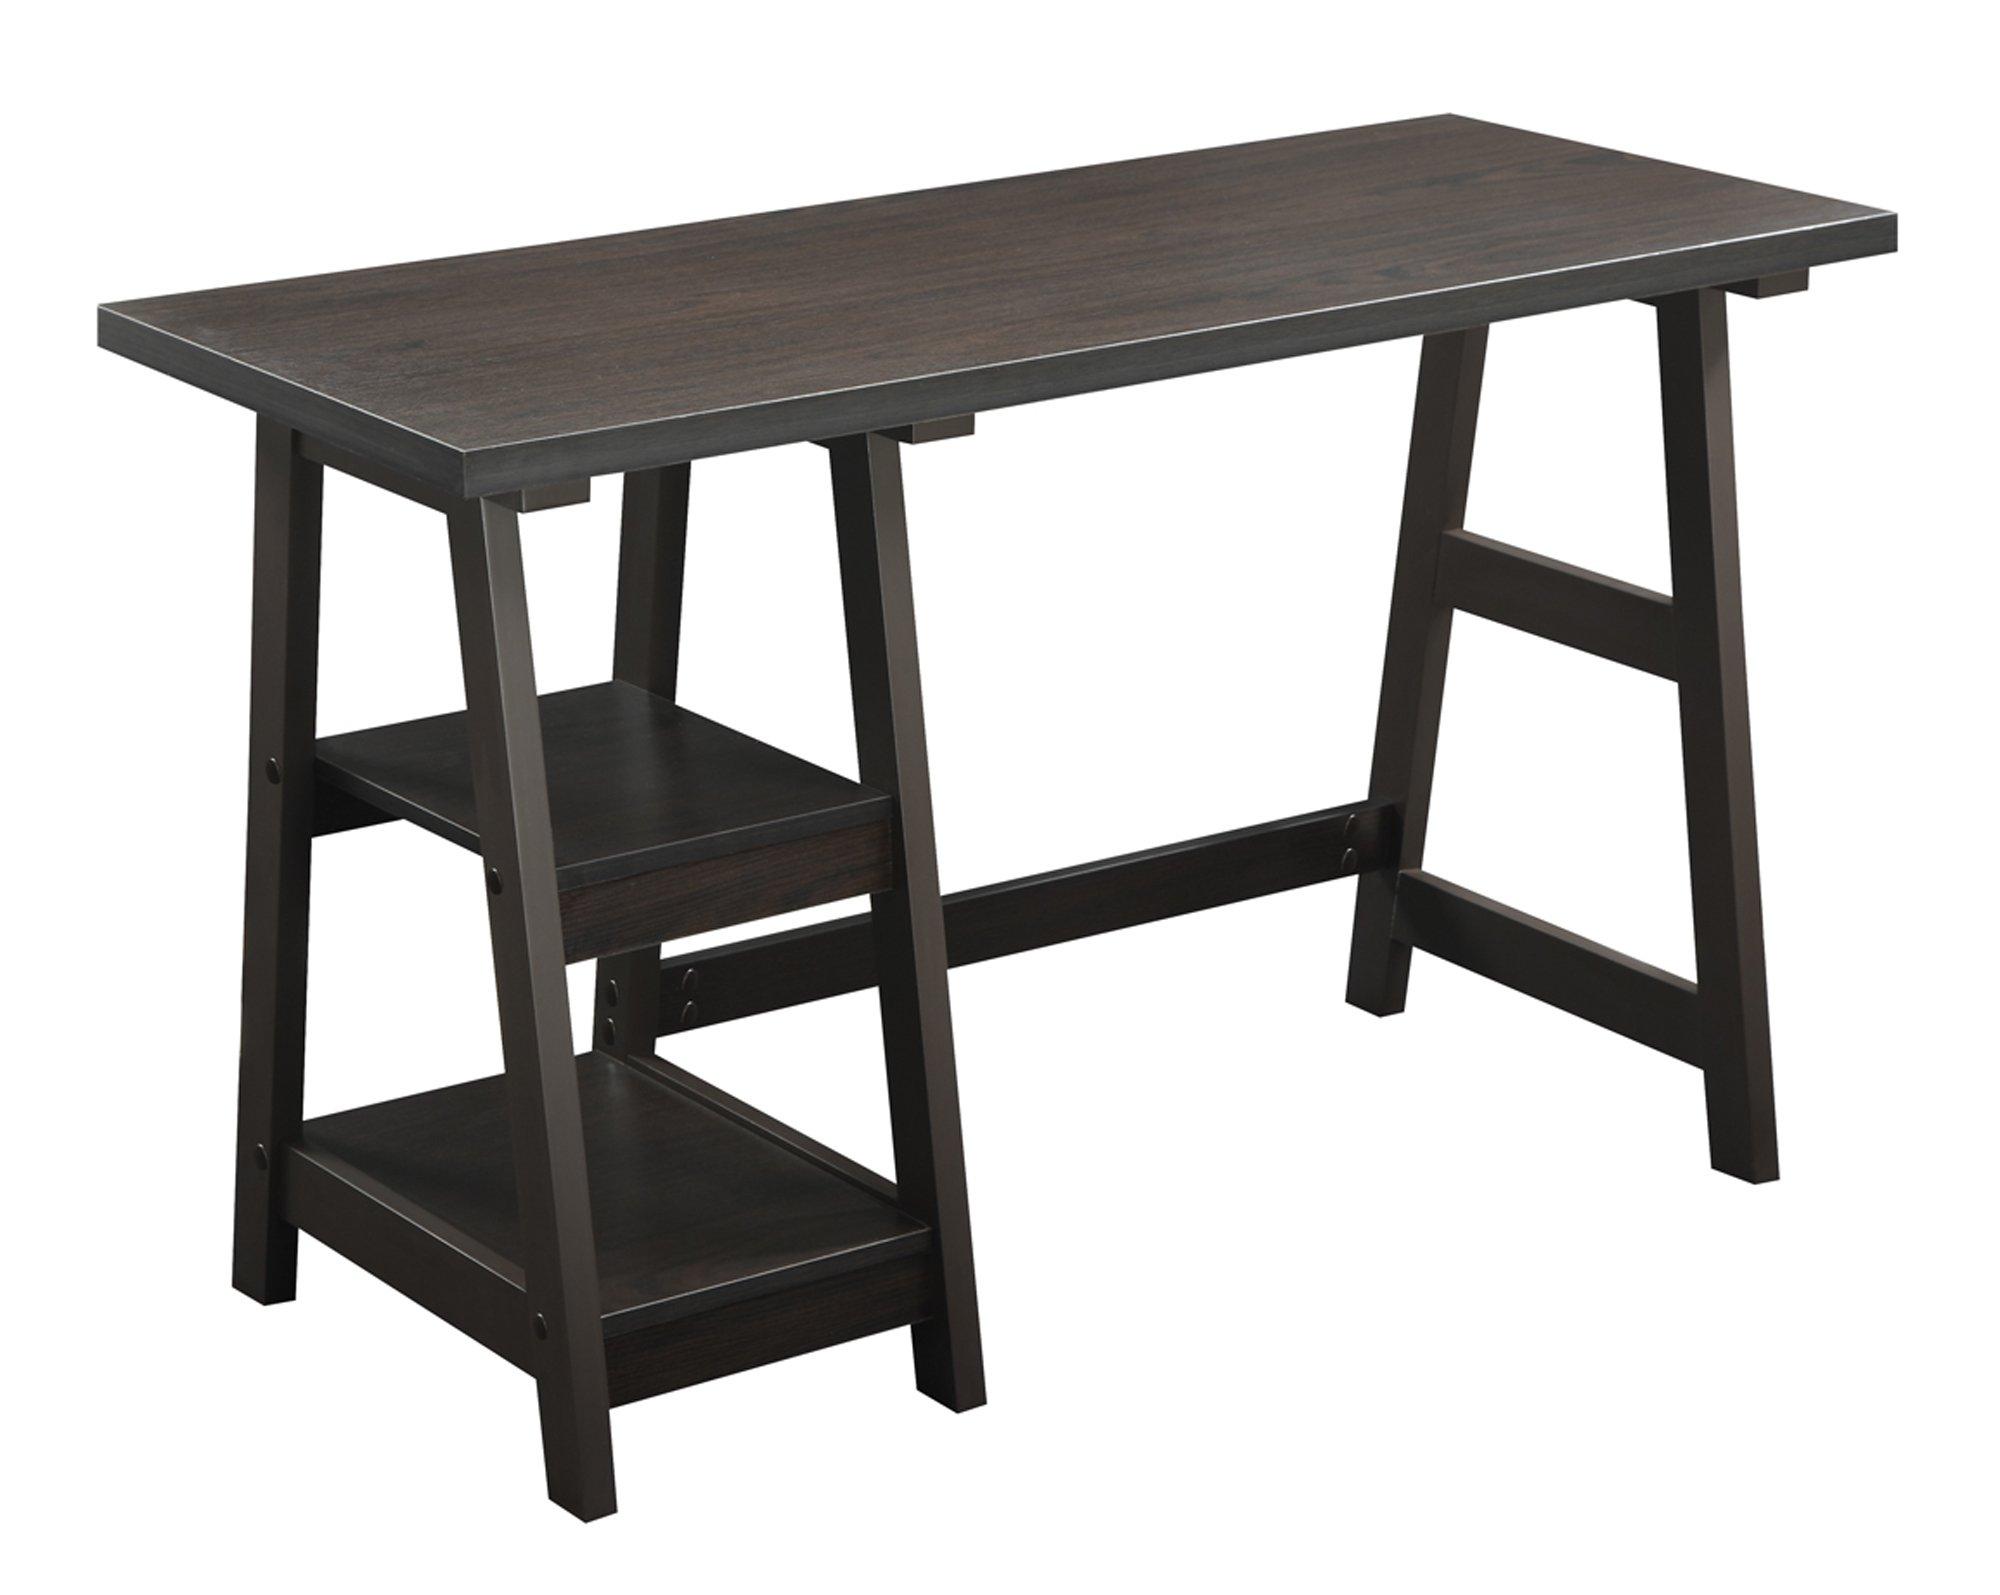 Convenience Concepts Designs2Go Trestle Desk, Espresso